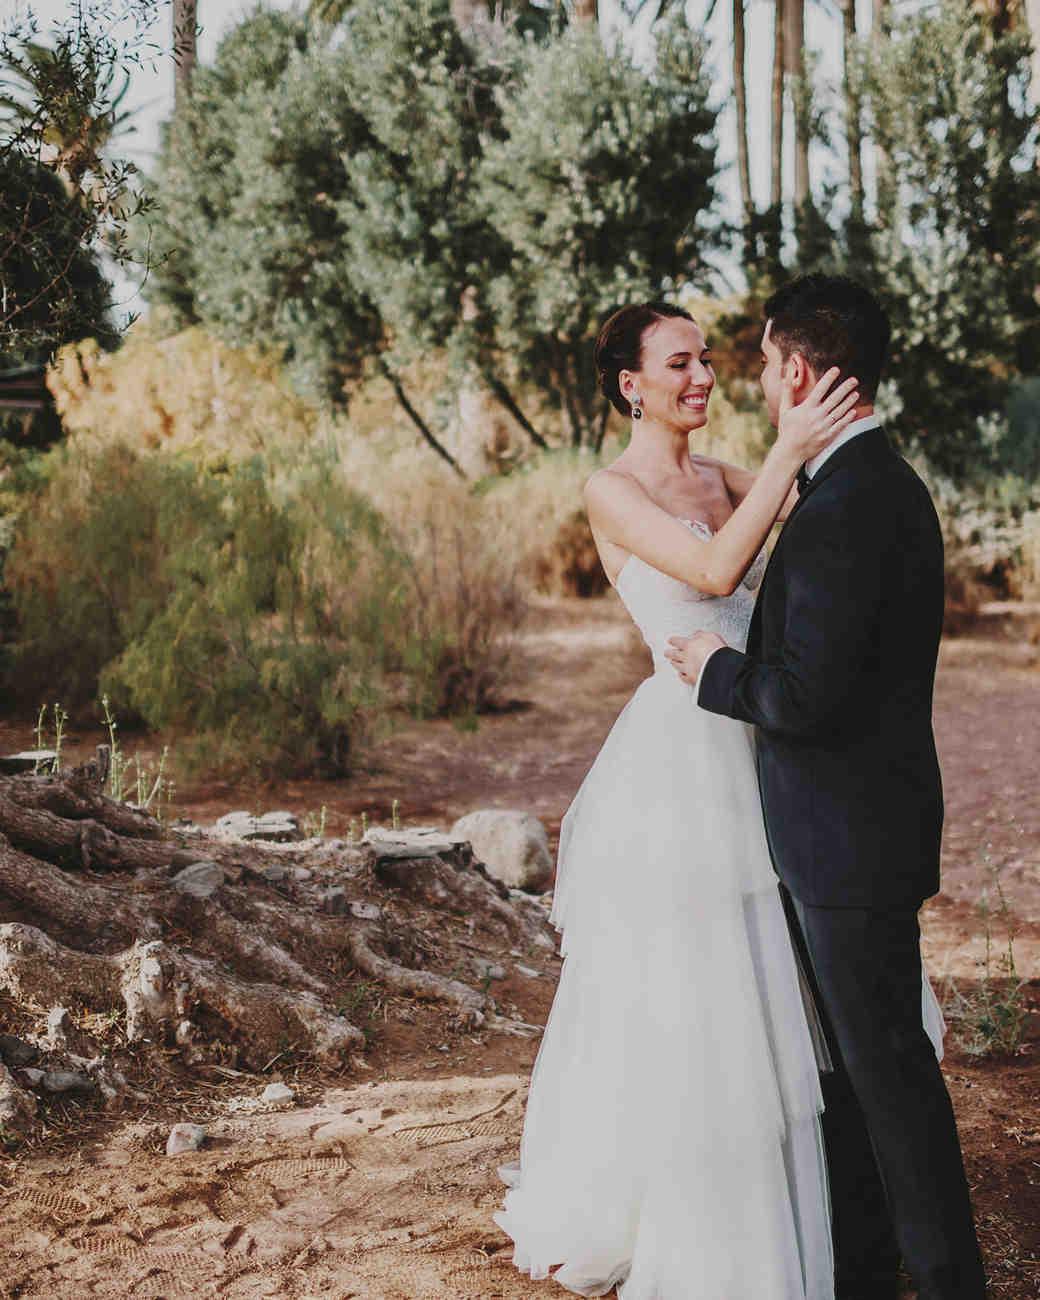 tamara-brett-wedding-couple-0666-s112120-0915.jpg